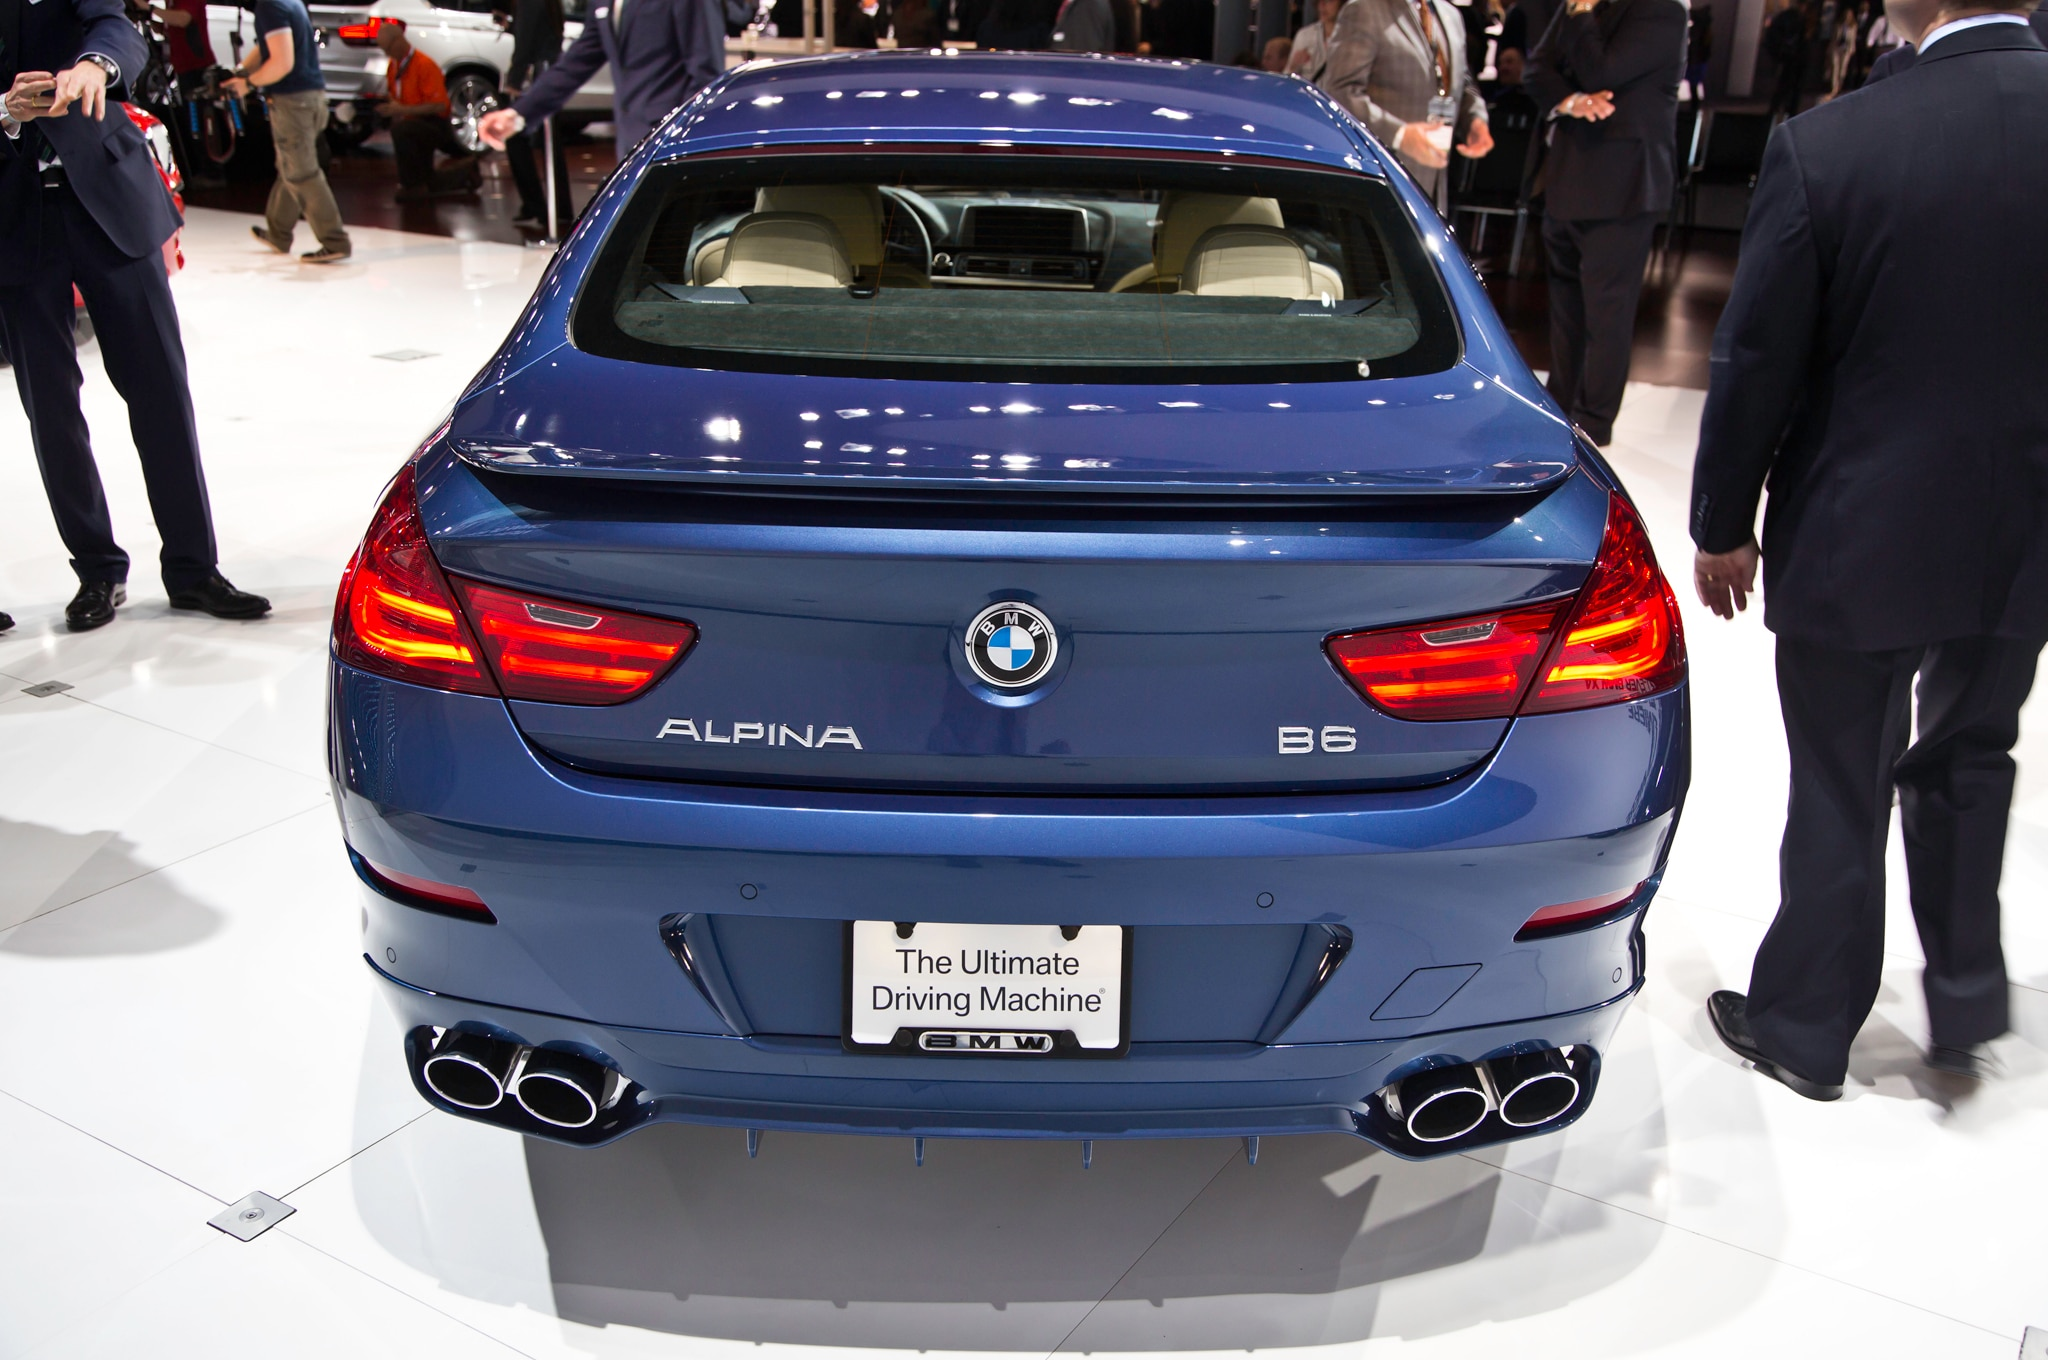 2015 Bmw Alpina B6 Xdrive Gran Coupe Revealed Automobile Magazine